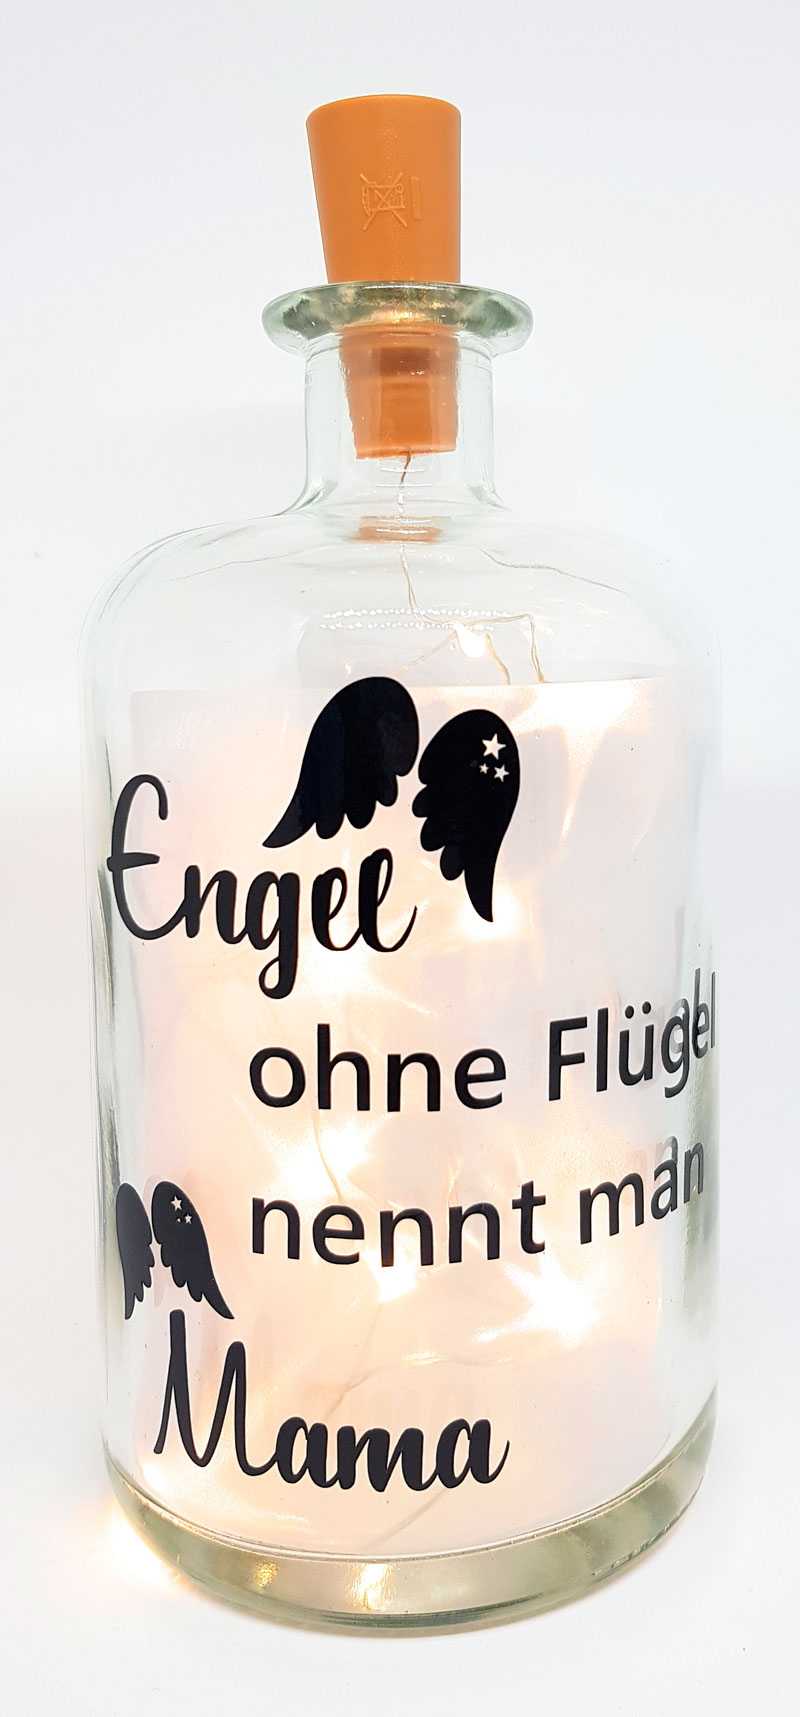 leuchtflasche-engel-druckwunder-geschenkideen-onlineshop-angebot-kirchheim